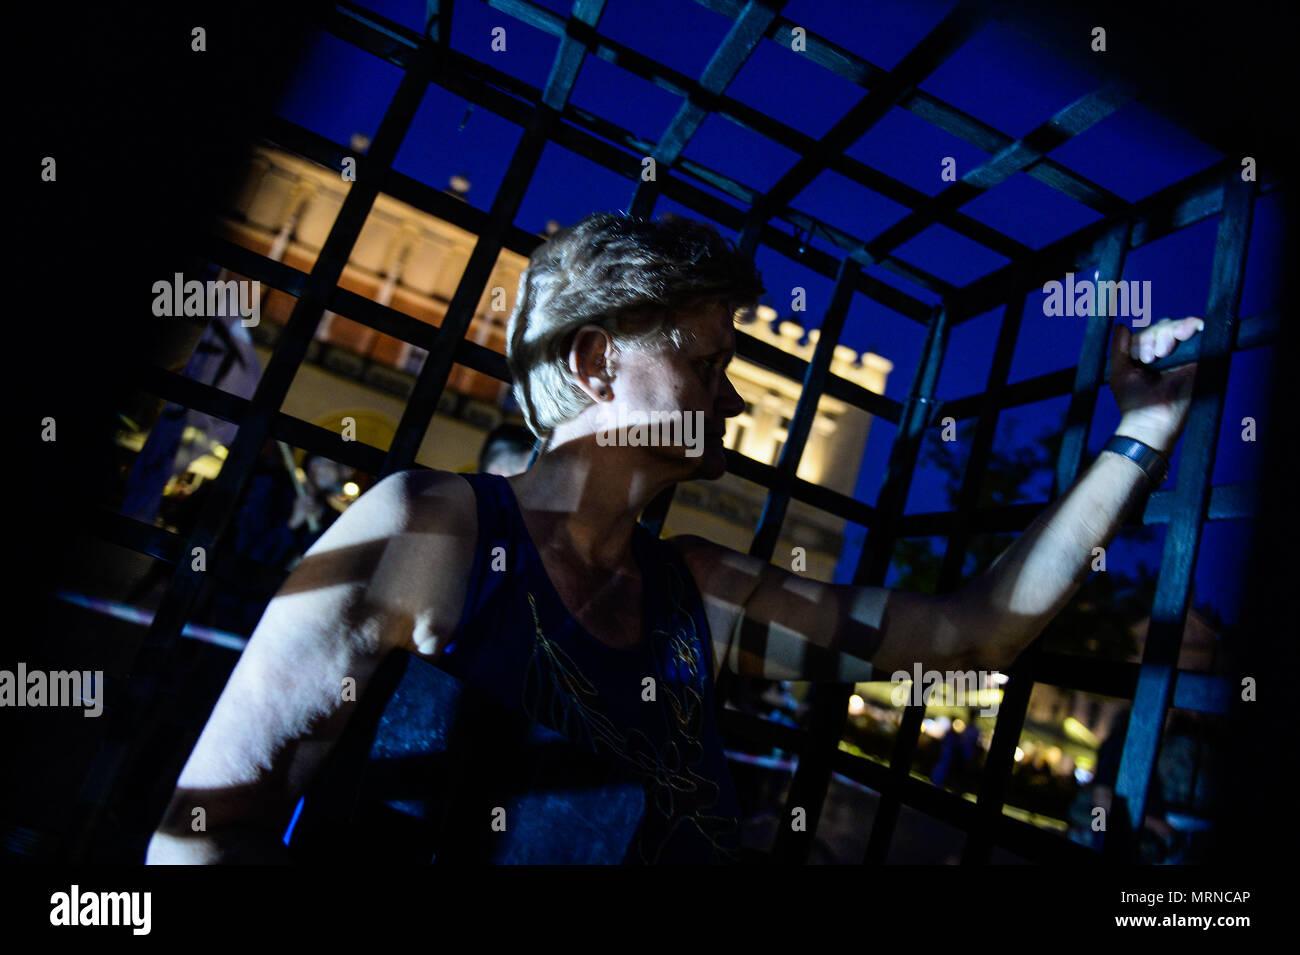 Woman Rights Poland Stockfotos & Woman Rights Poland Bilder - Alamy